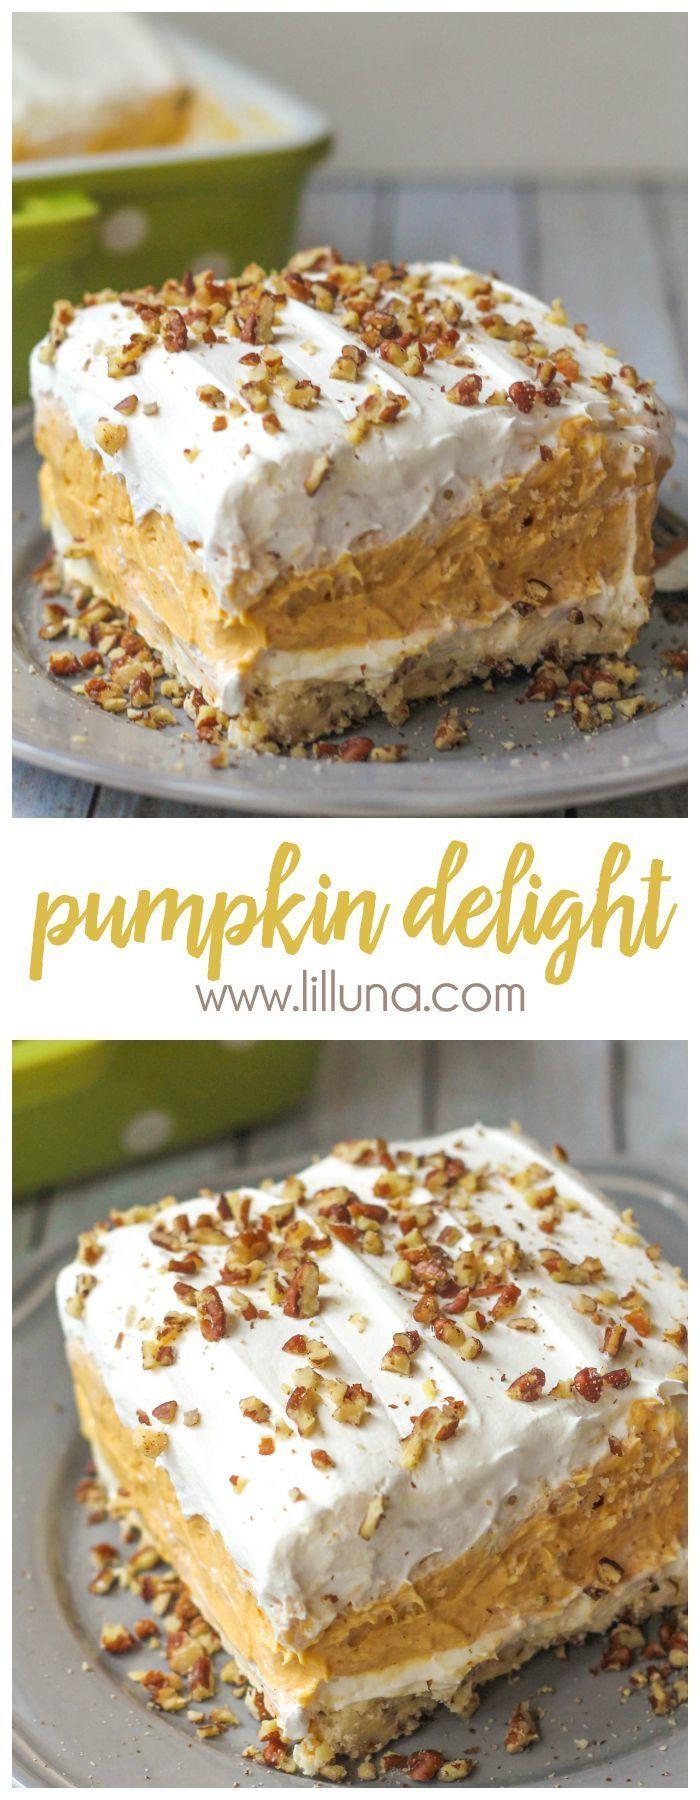 Pumpkin Recipes For Fall  2206 best Fall PUMPKIN Desserts Recipes images on